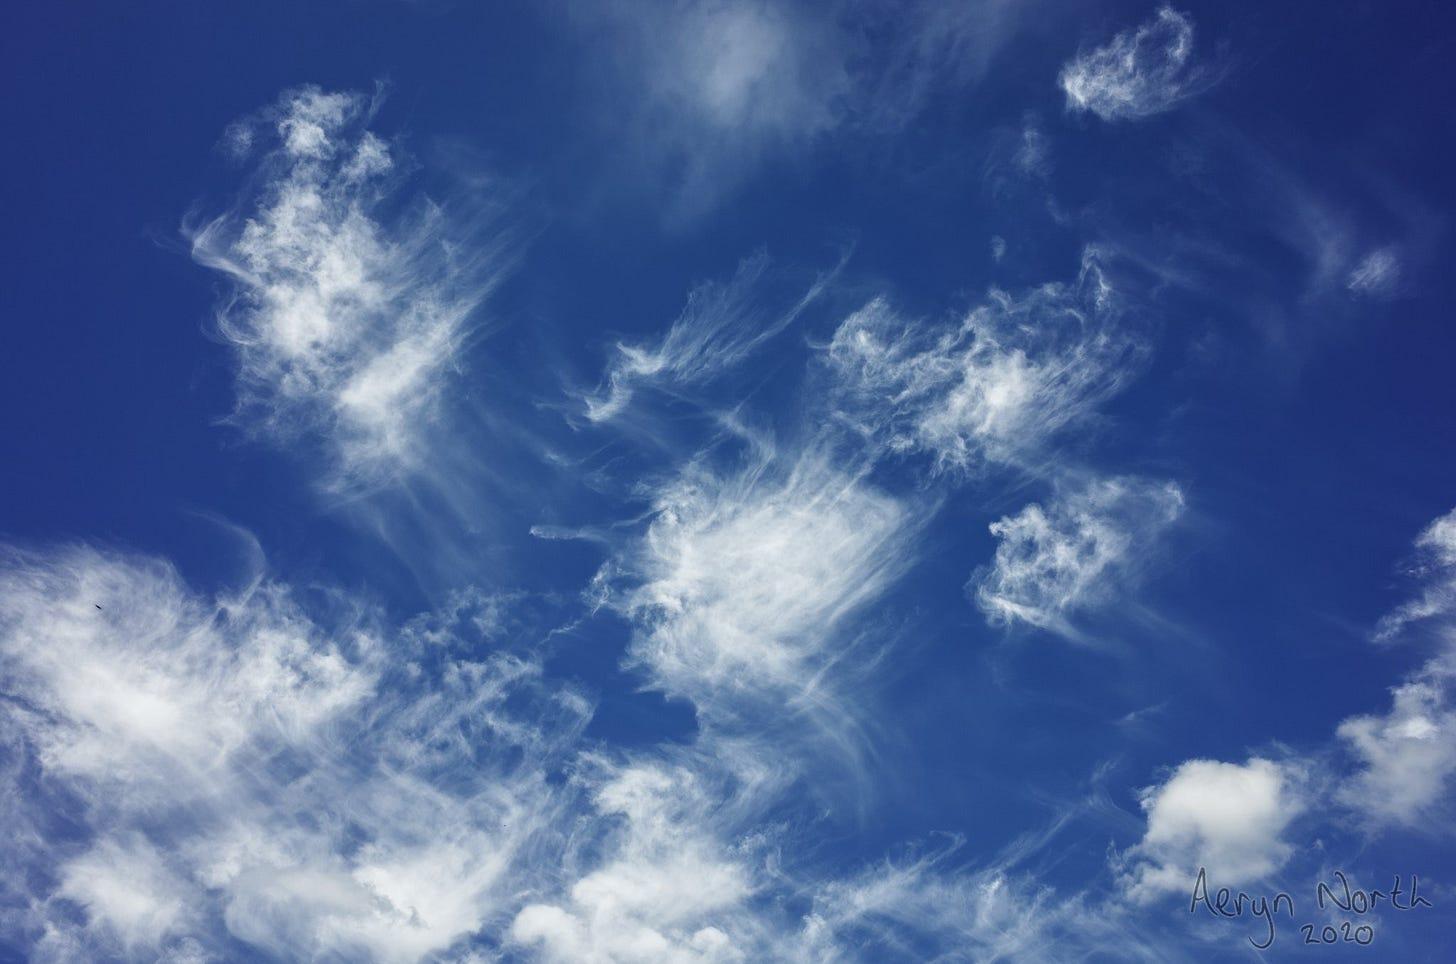 20201207-1148-11-painted-clouds-high-lane-by-Aeryn-North.jpg